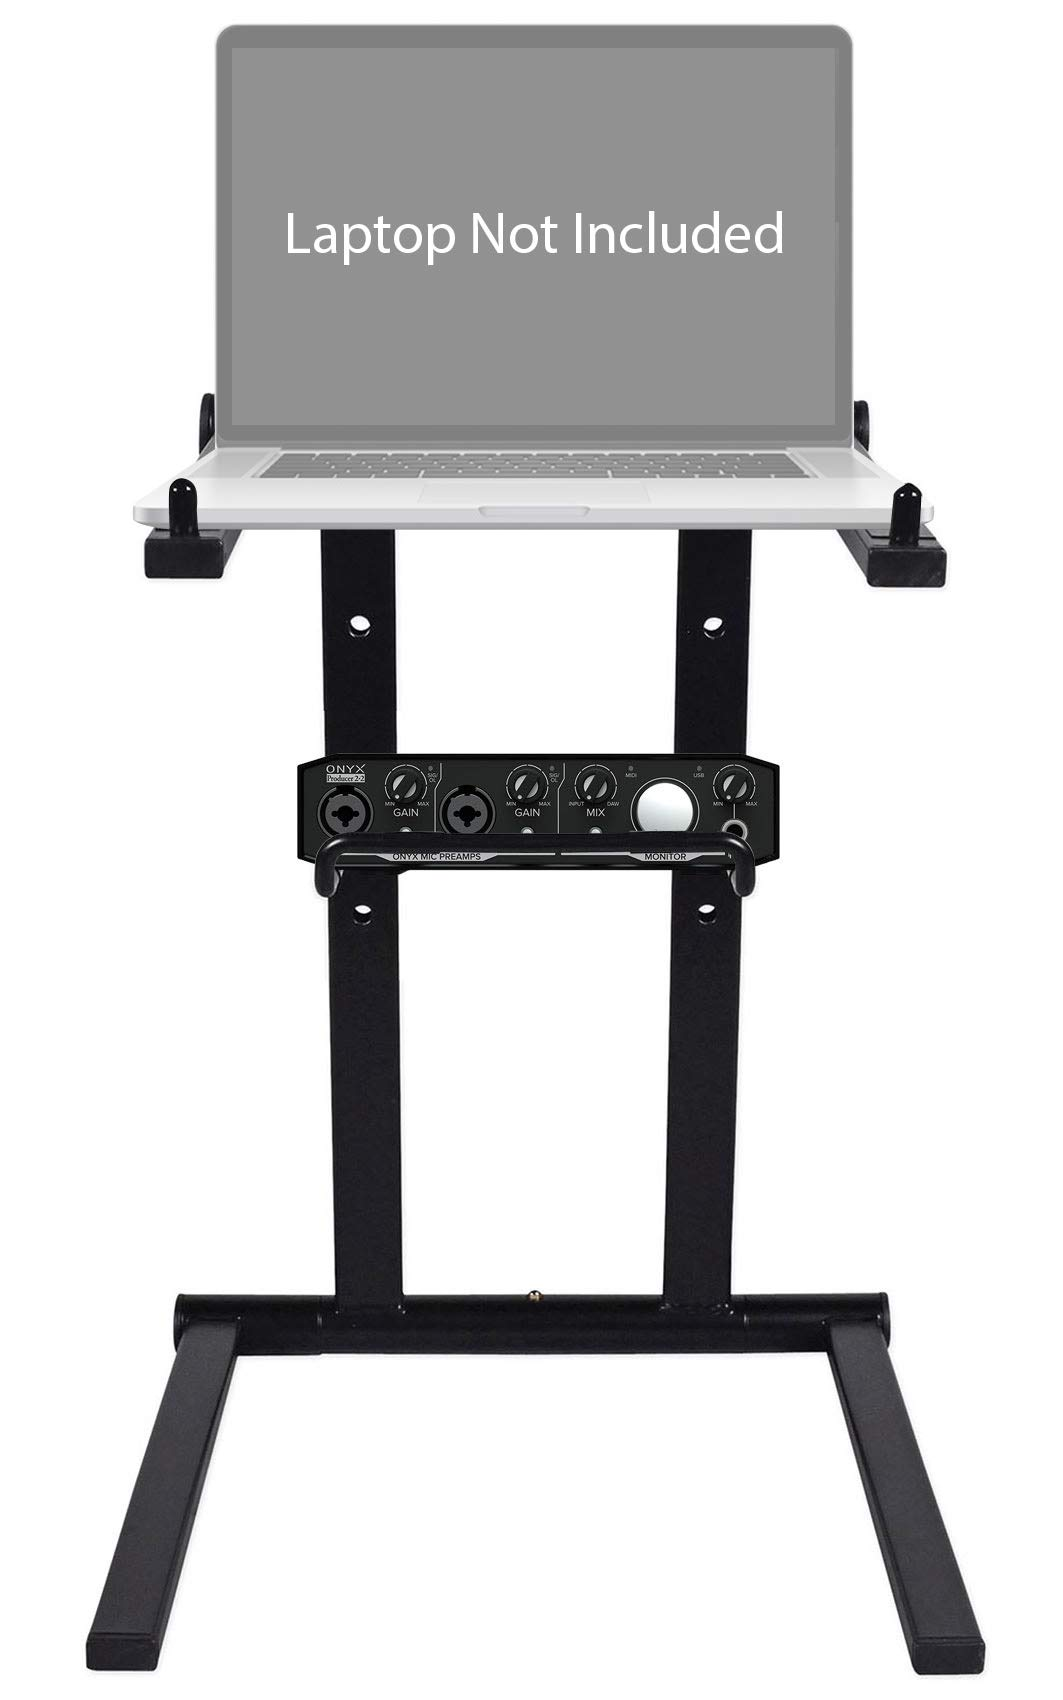 Mackie Onyx Producer 2.2 2x2 USB Audio MIDI Recording Studio Interface + Stand by Mackie (Image #1)